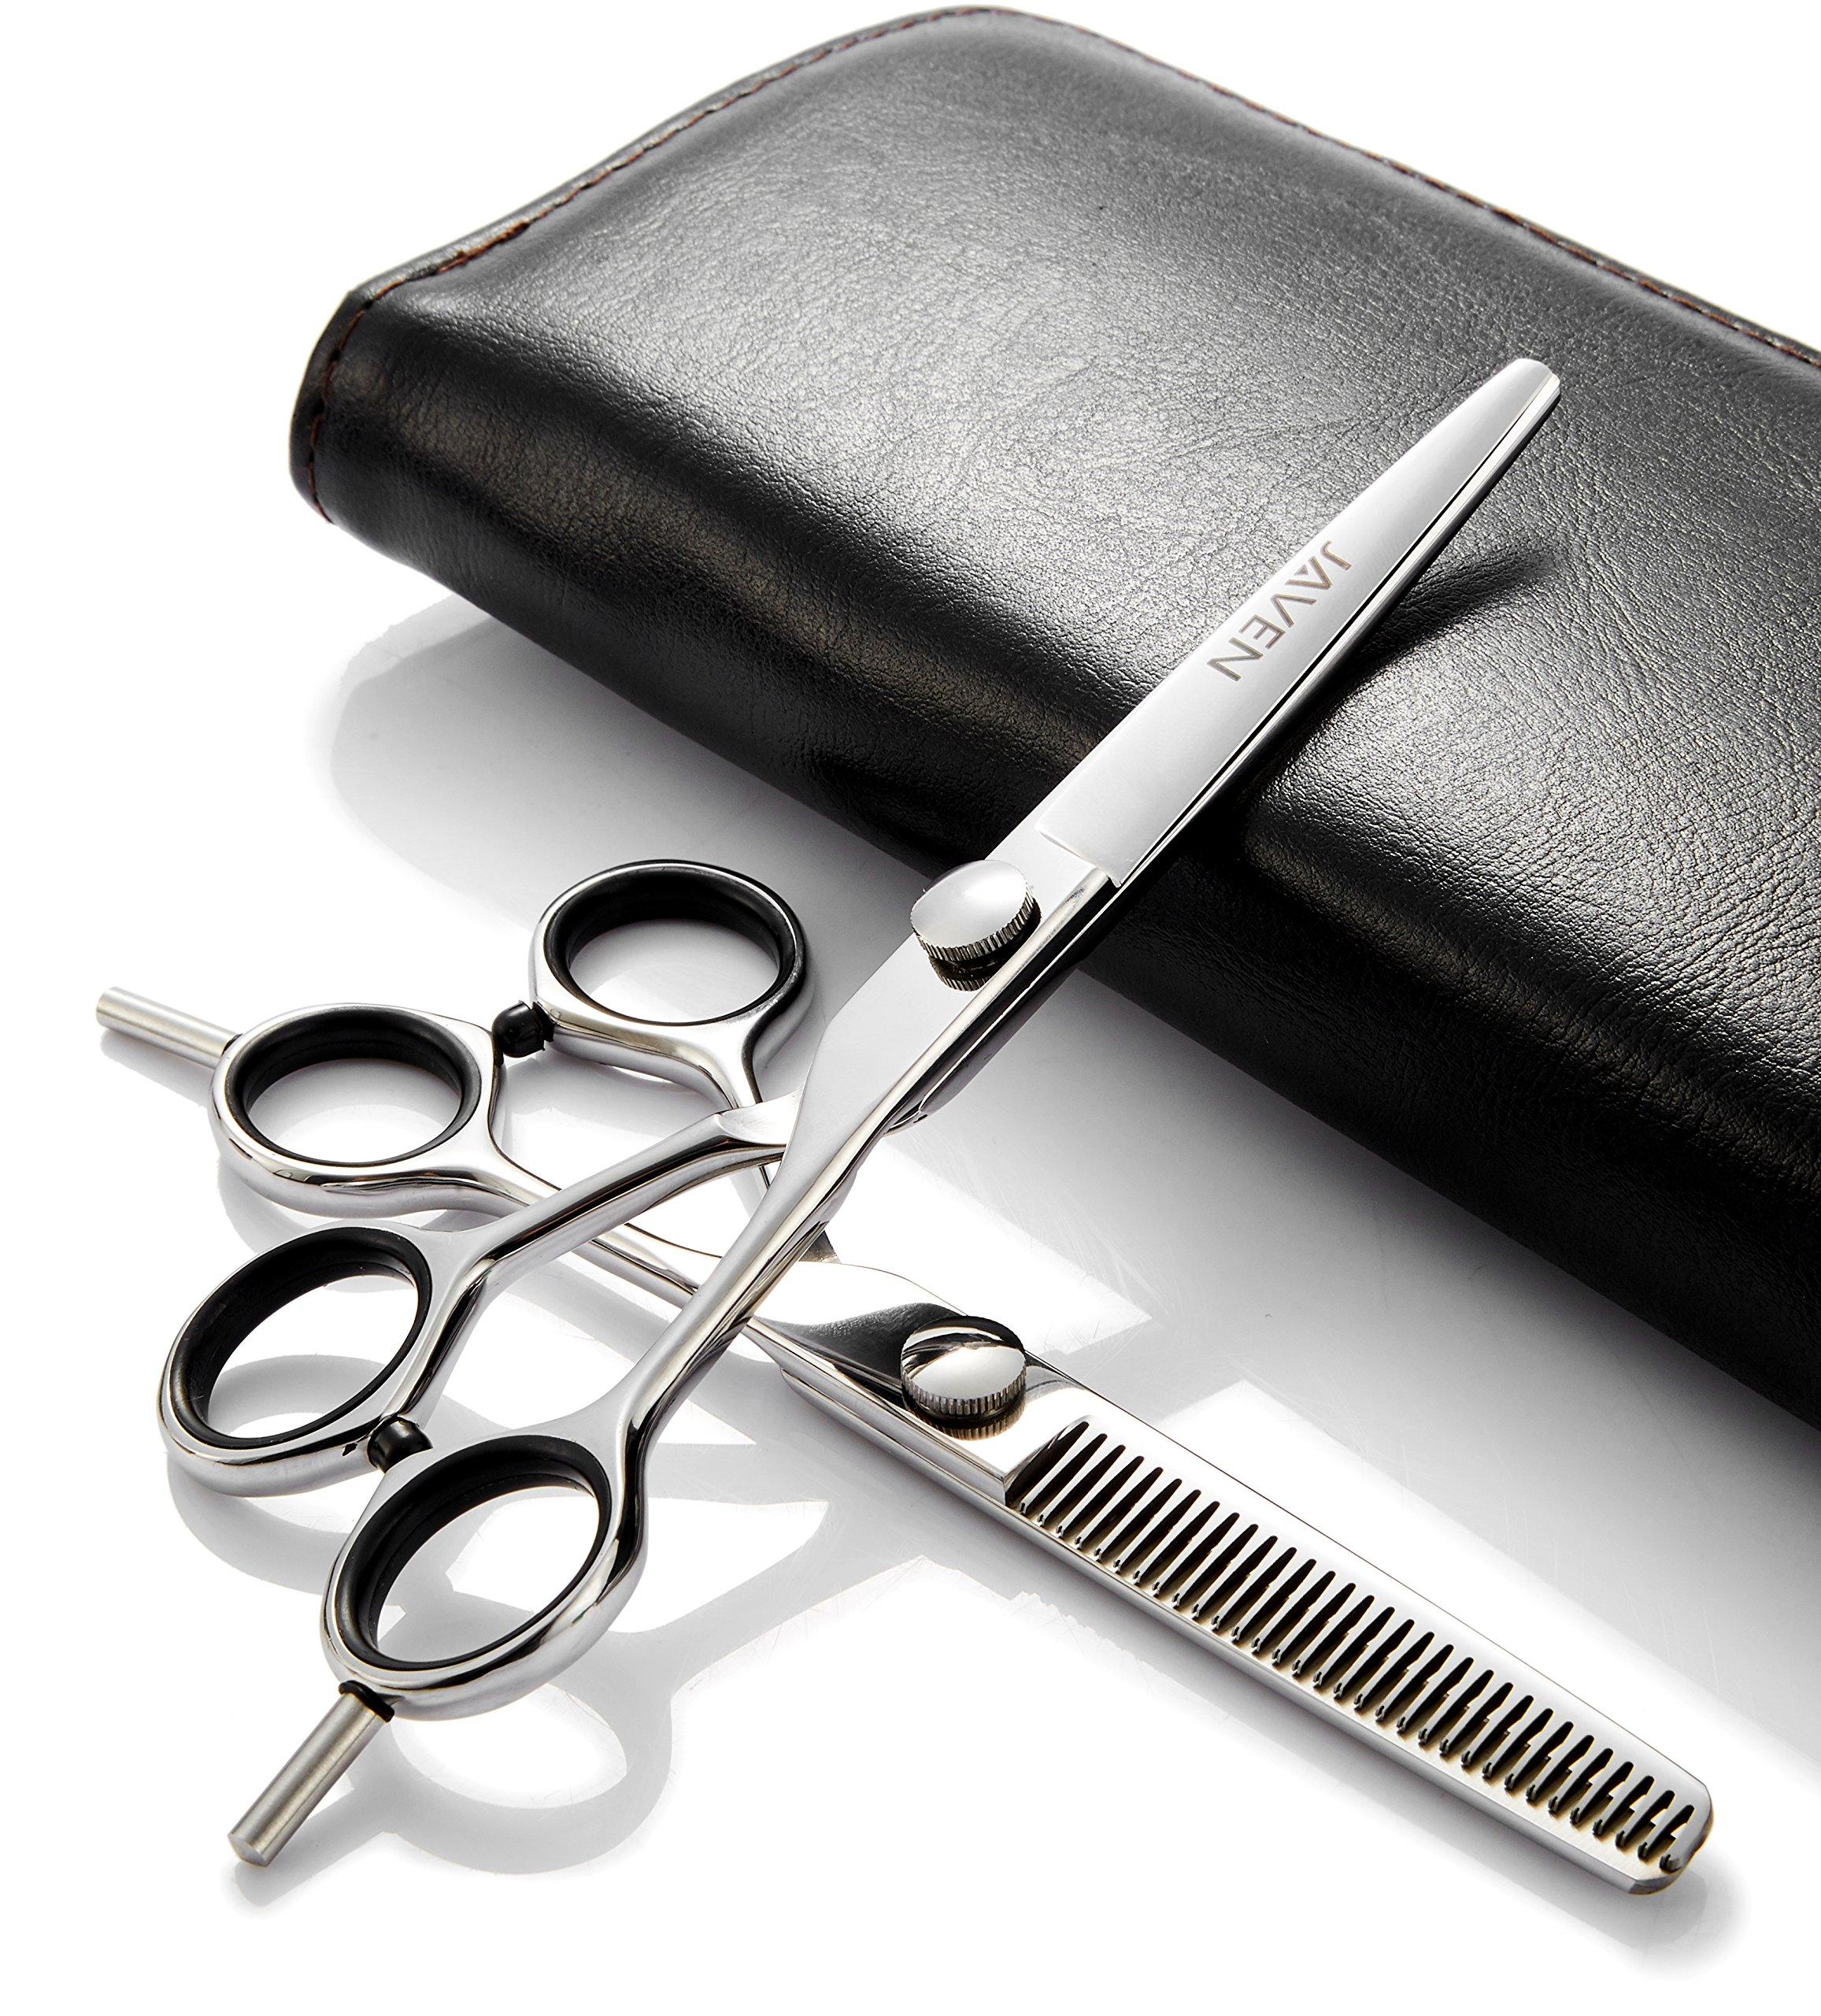 2018 Professional Hair Cutting Scissors Set,Japanese 6.5 Inch Hair Scissors Teflon Shears Hairdressing Scissors Barber Thinning Scissors Hairdresser Razor Edge Haircut Right hand use